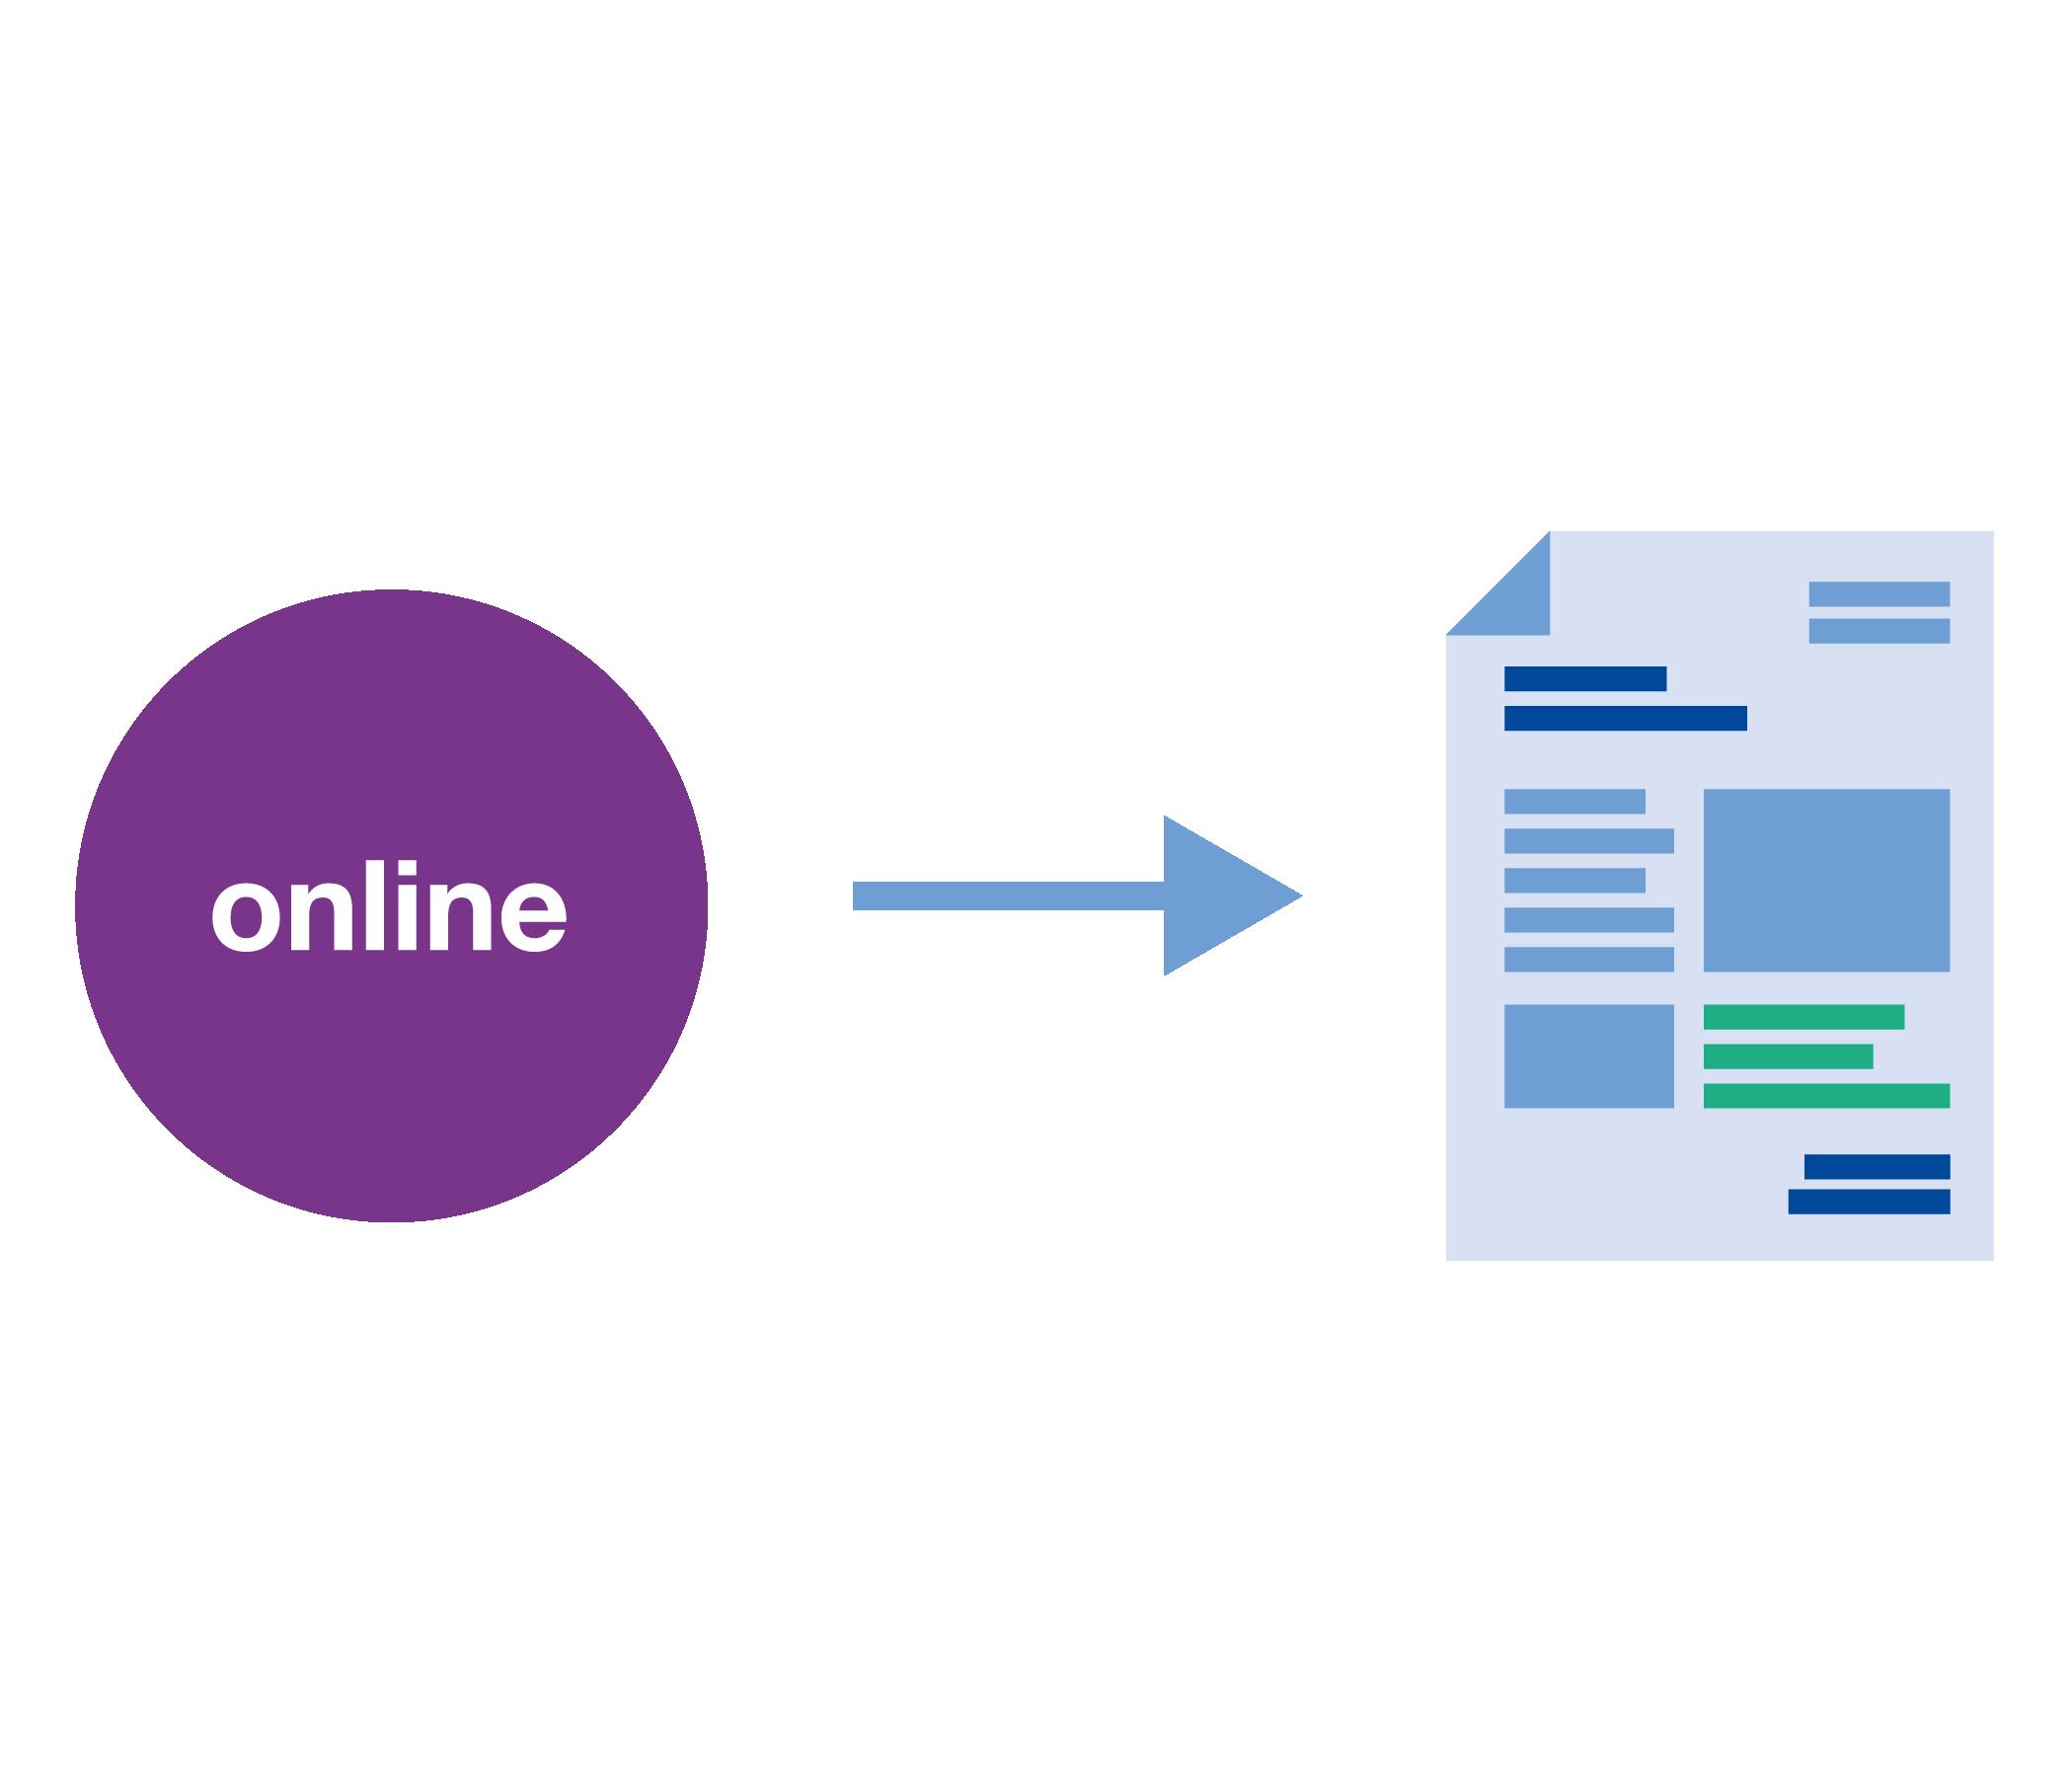 Online clients communication processing